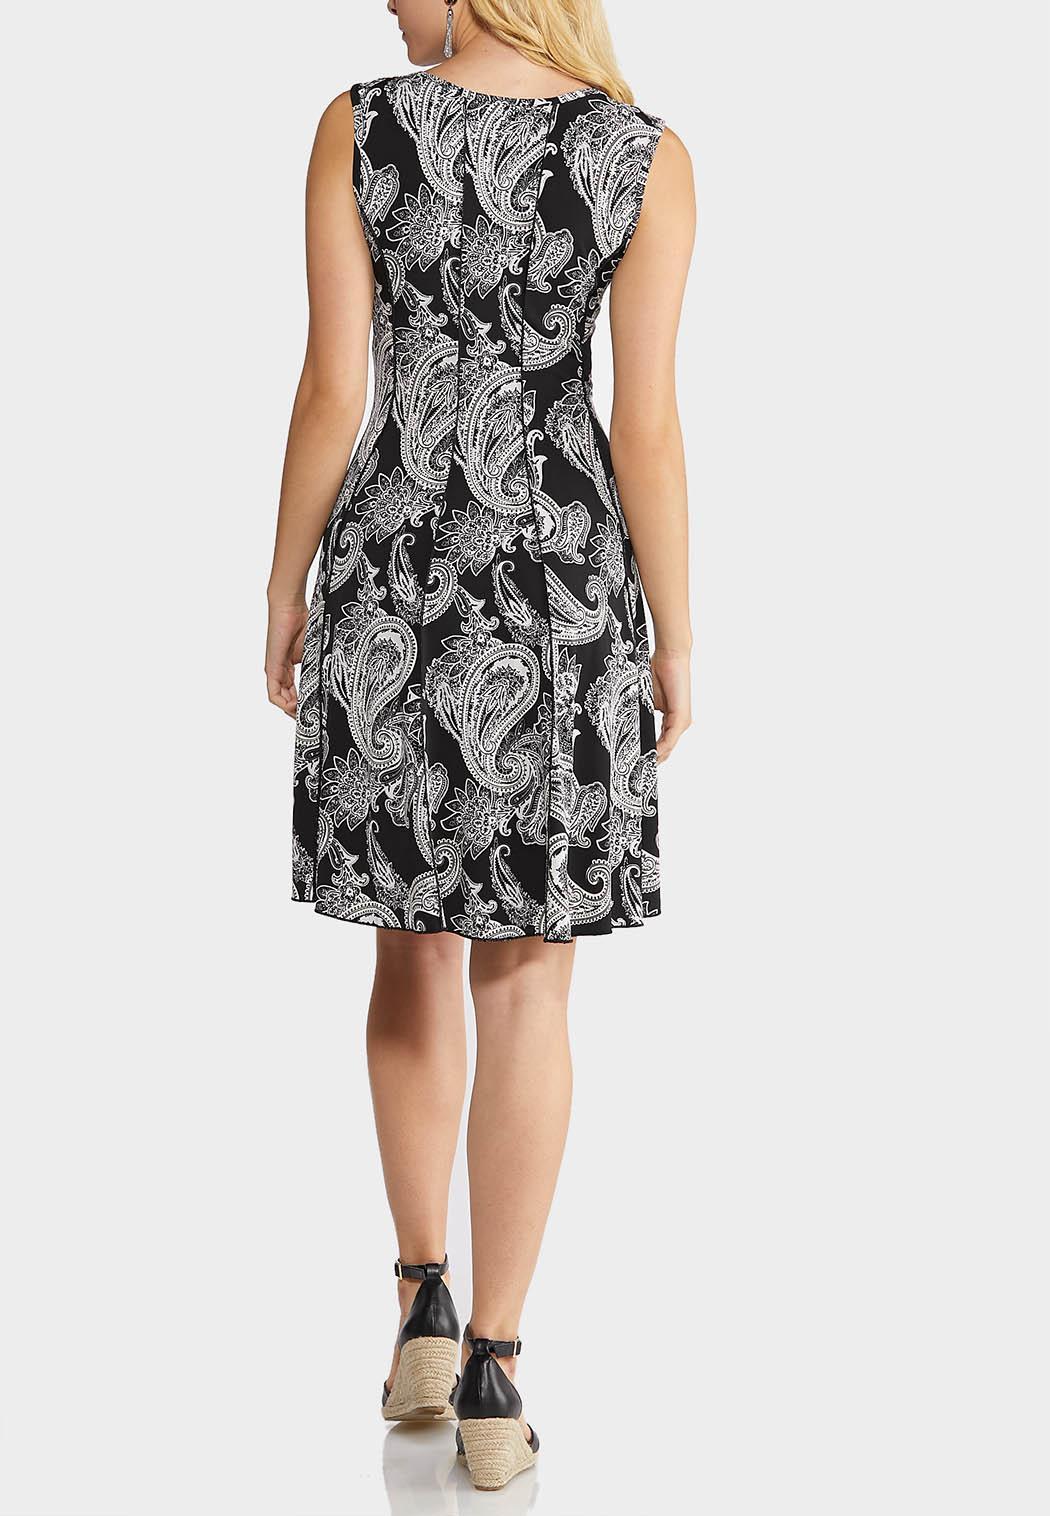 Paisley Print Hardware Dress (Item #43902776)